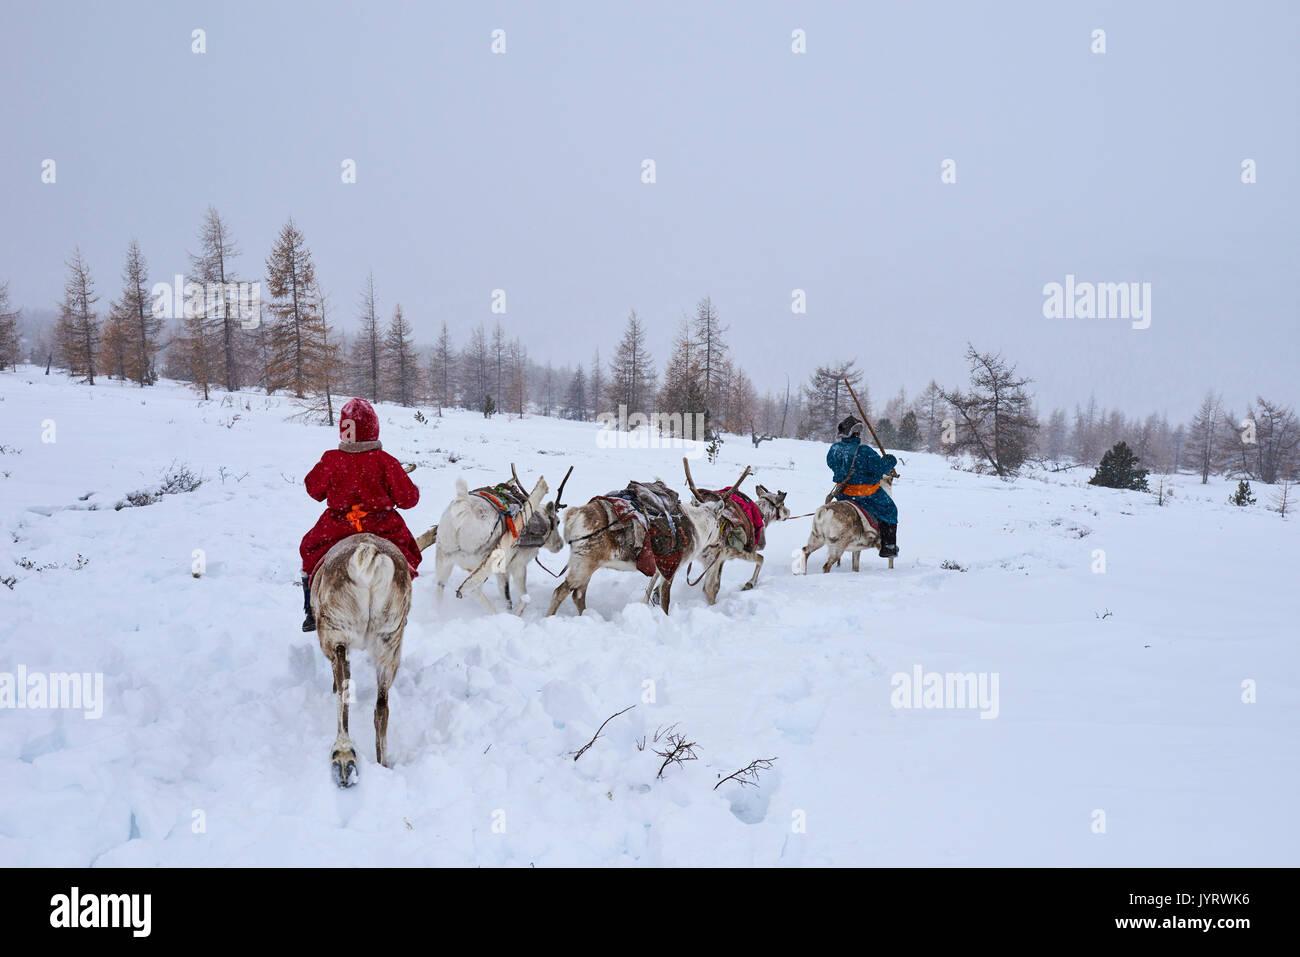 Mongolia, Khovsgol province, the Tsaatan, reindeer herder, winter migration, transhumance - Stock Image